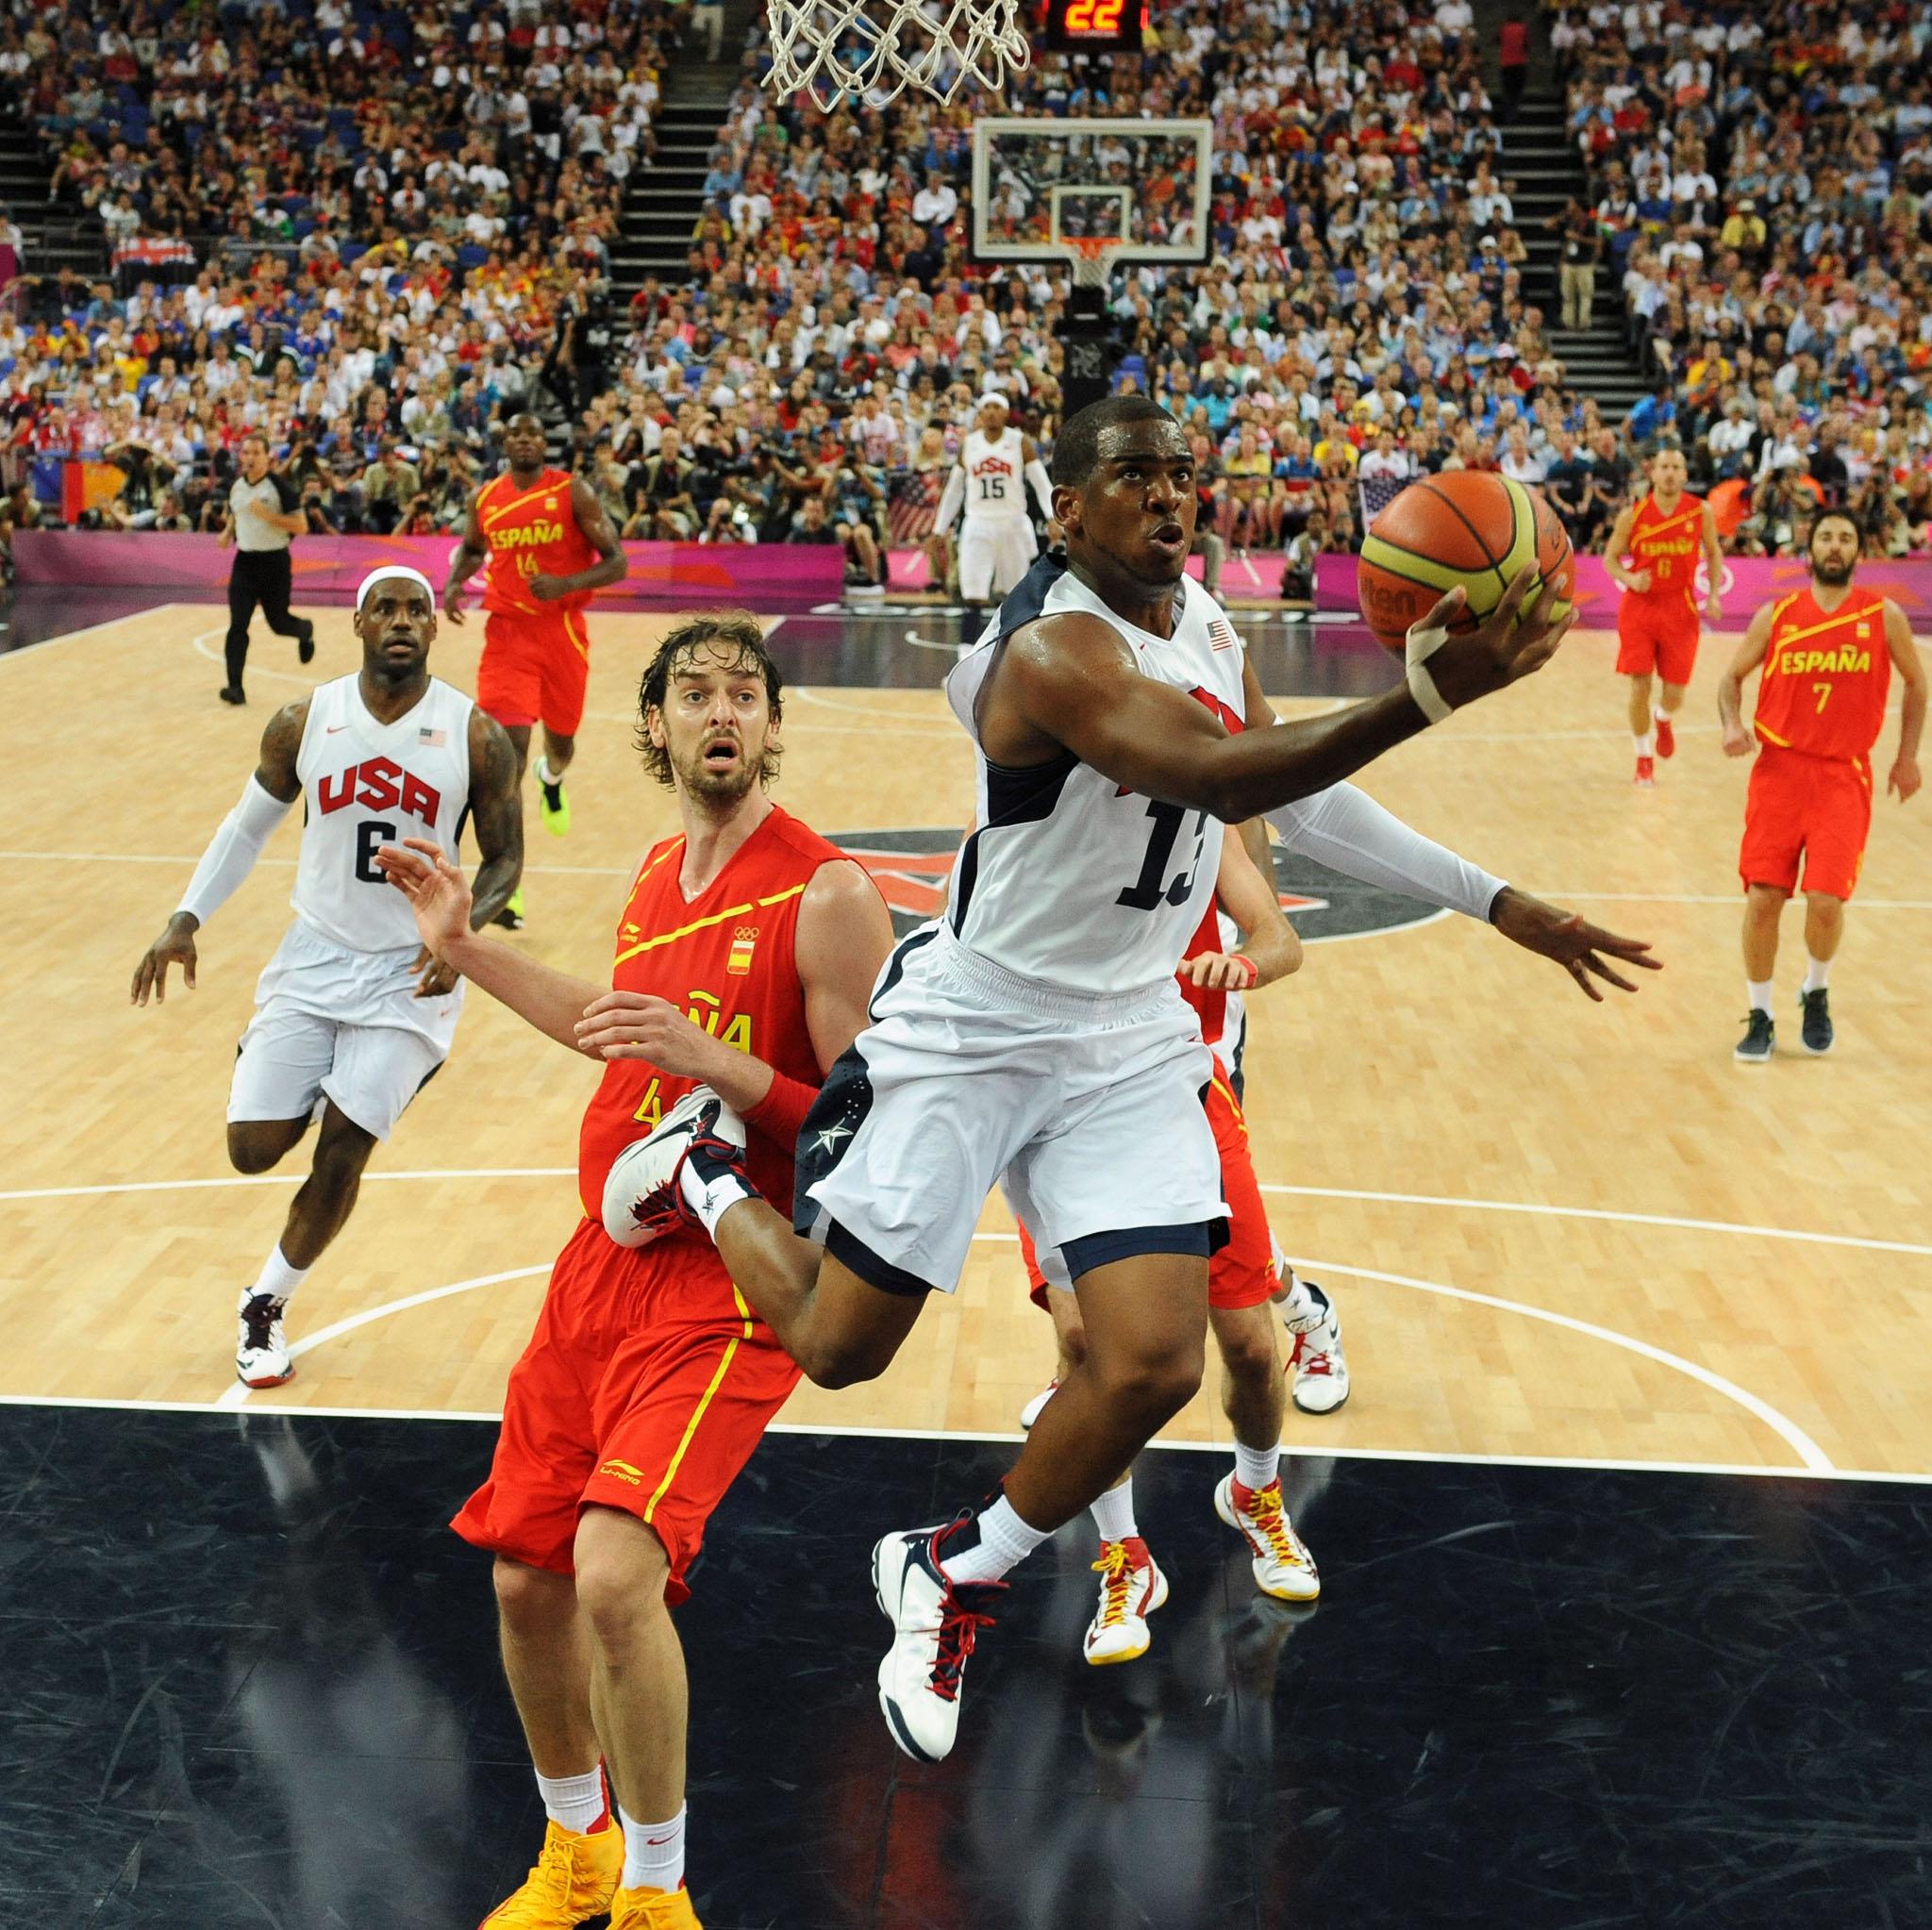 olympic-moments-mensbasketball1.jpg